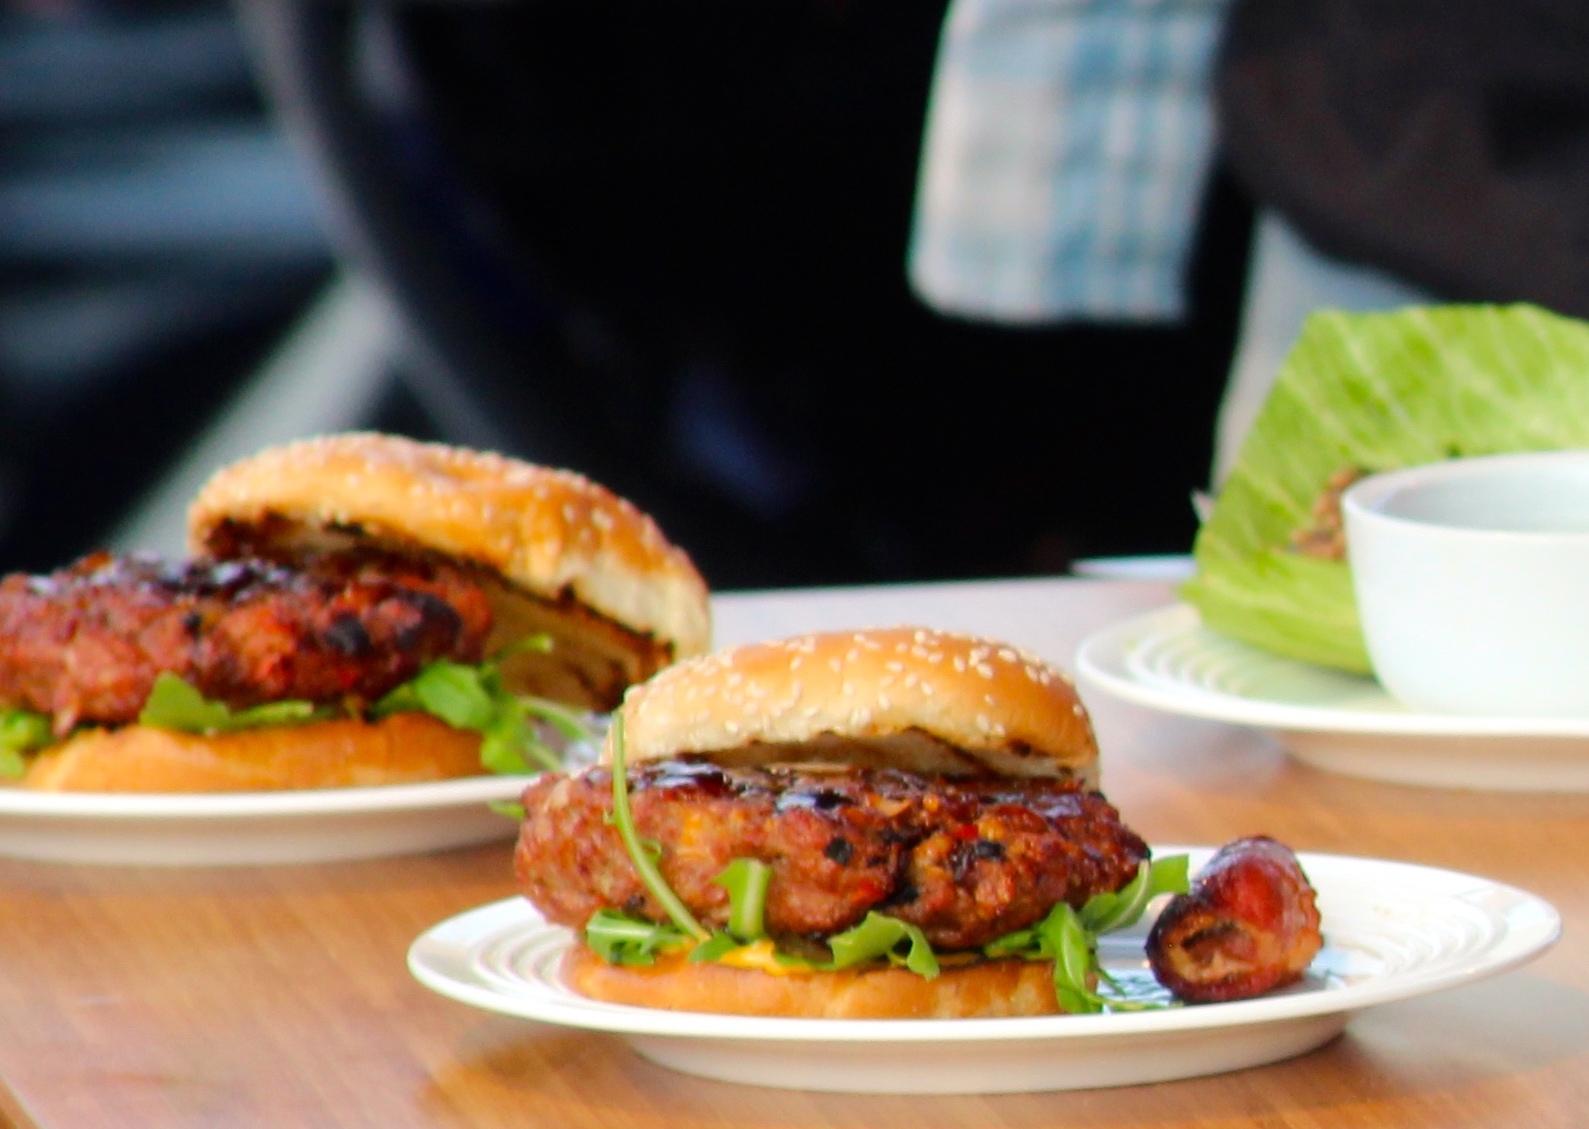 Bacon Stuffed Burger